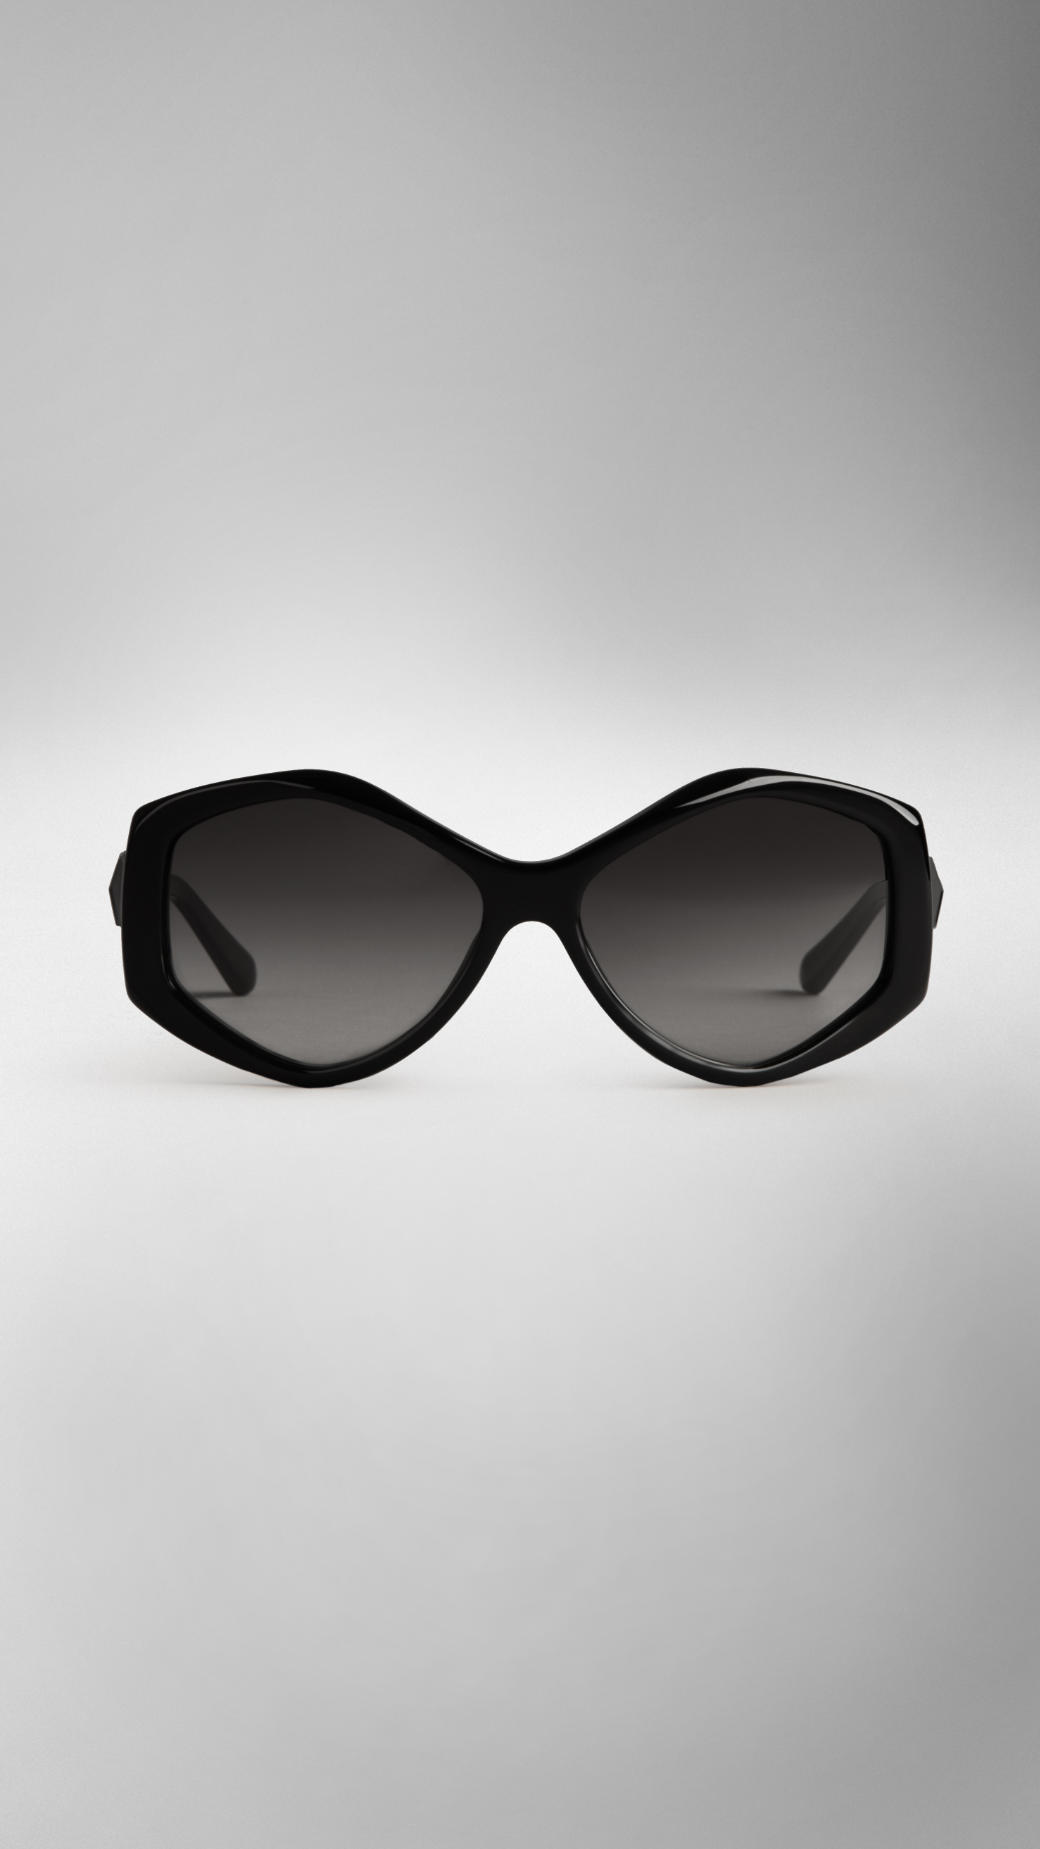 Burberry Faceted Hexagonal Sunglasses in Black